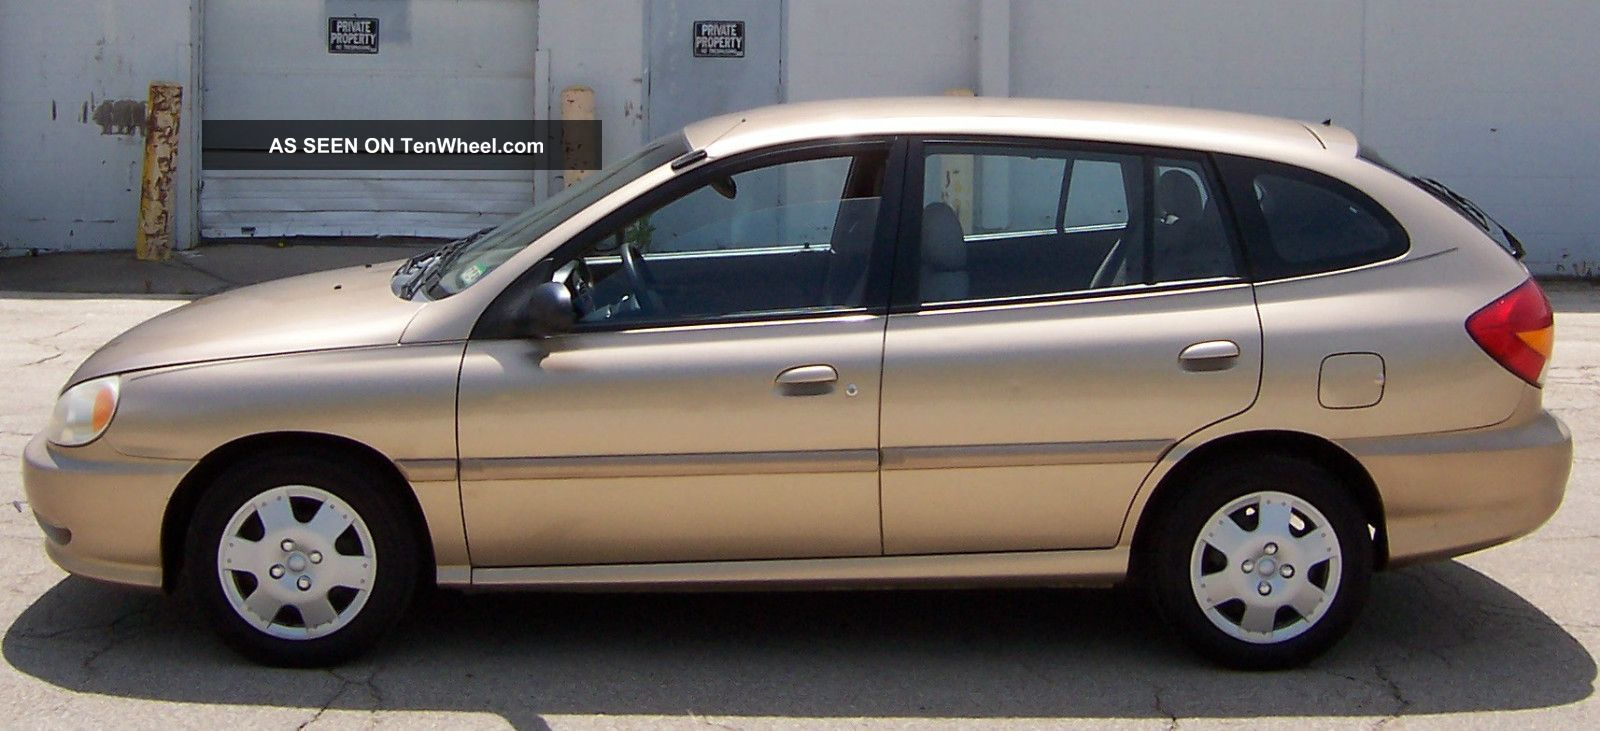 2002 Kia Rio 4 Door Sedan Great Inexpensive Economical